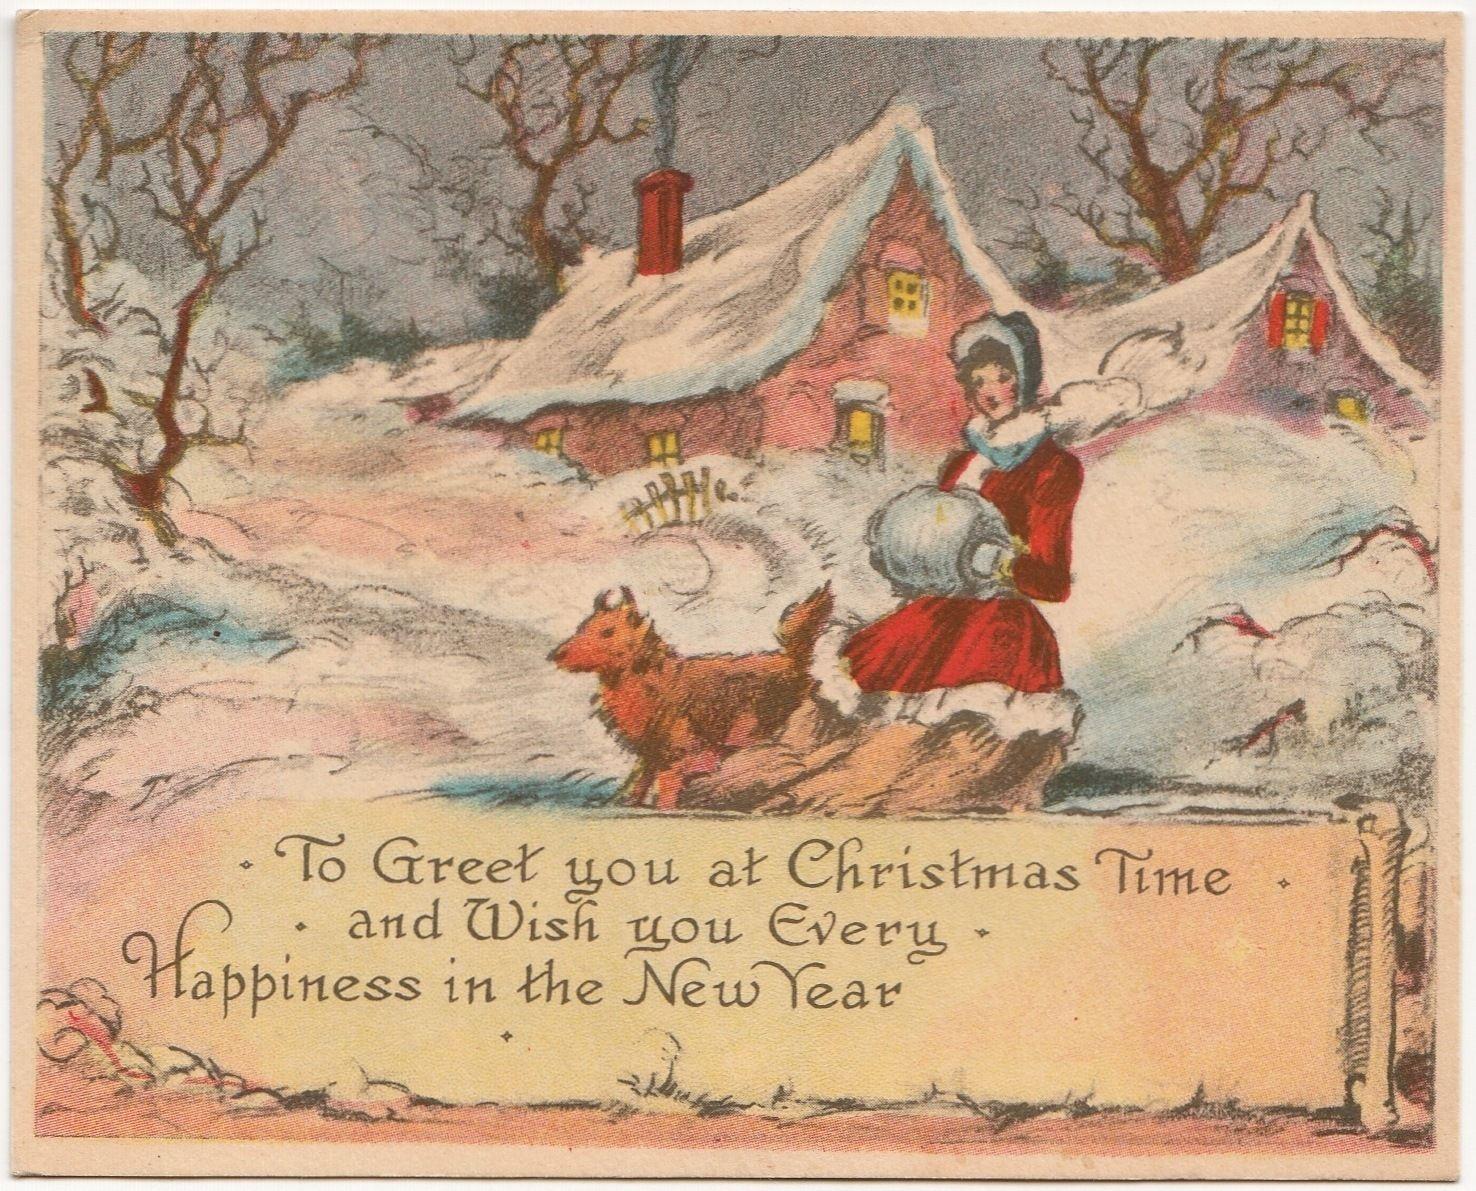 Christmas house with snow art - Vintage Single Layer Greeting Card Christmas Lady Dog House Snow Art Deco A197 Ebay